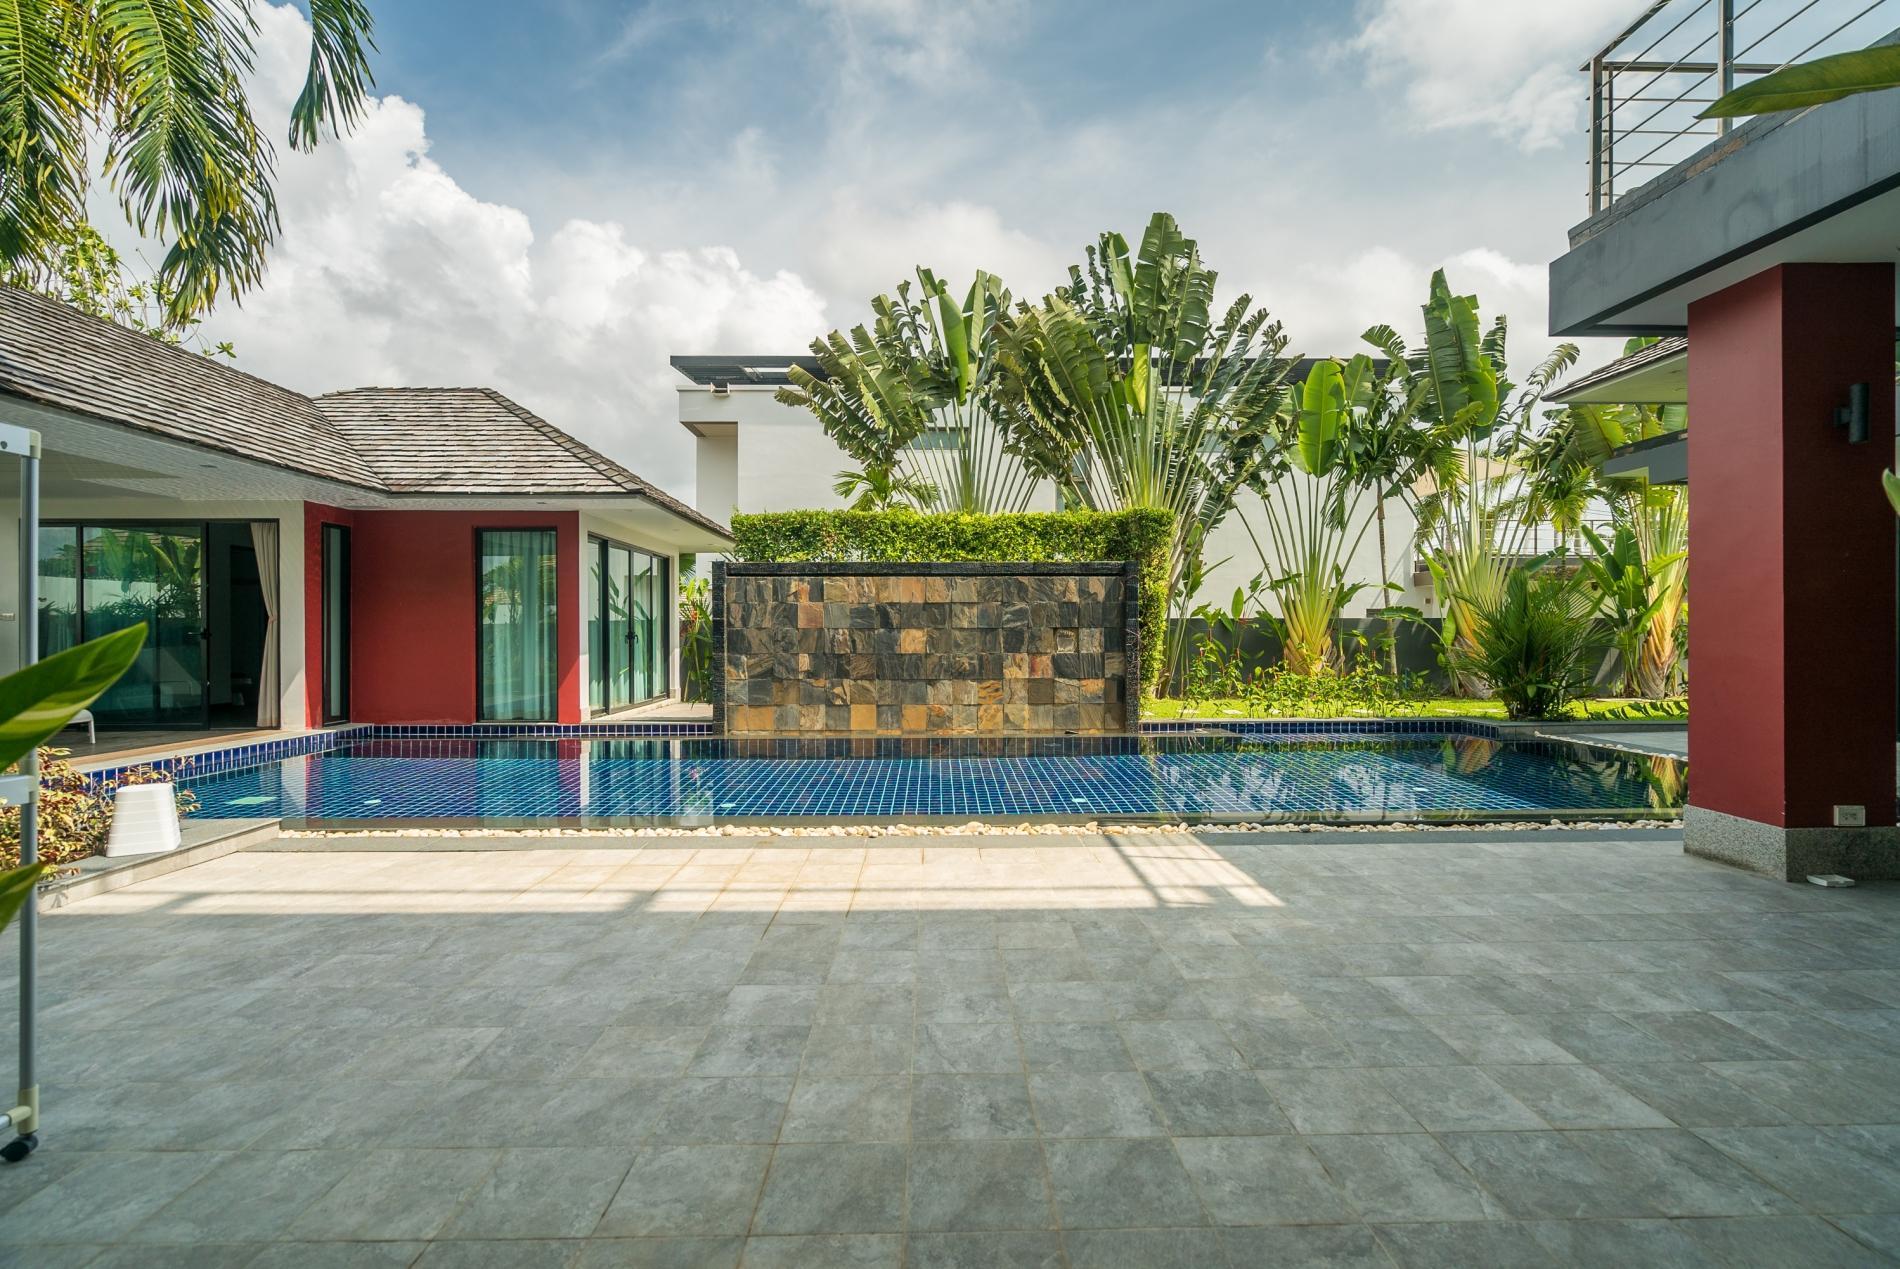 Apartment Diamond 272 - Modern 4 br private pool and garden villa photo 26956872